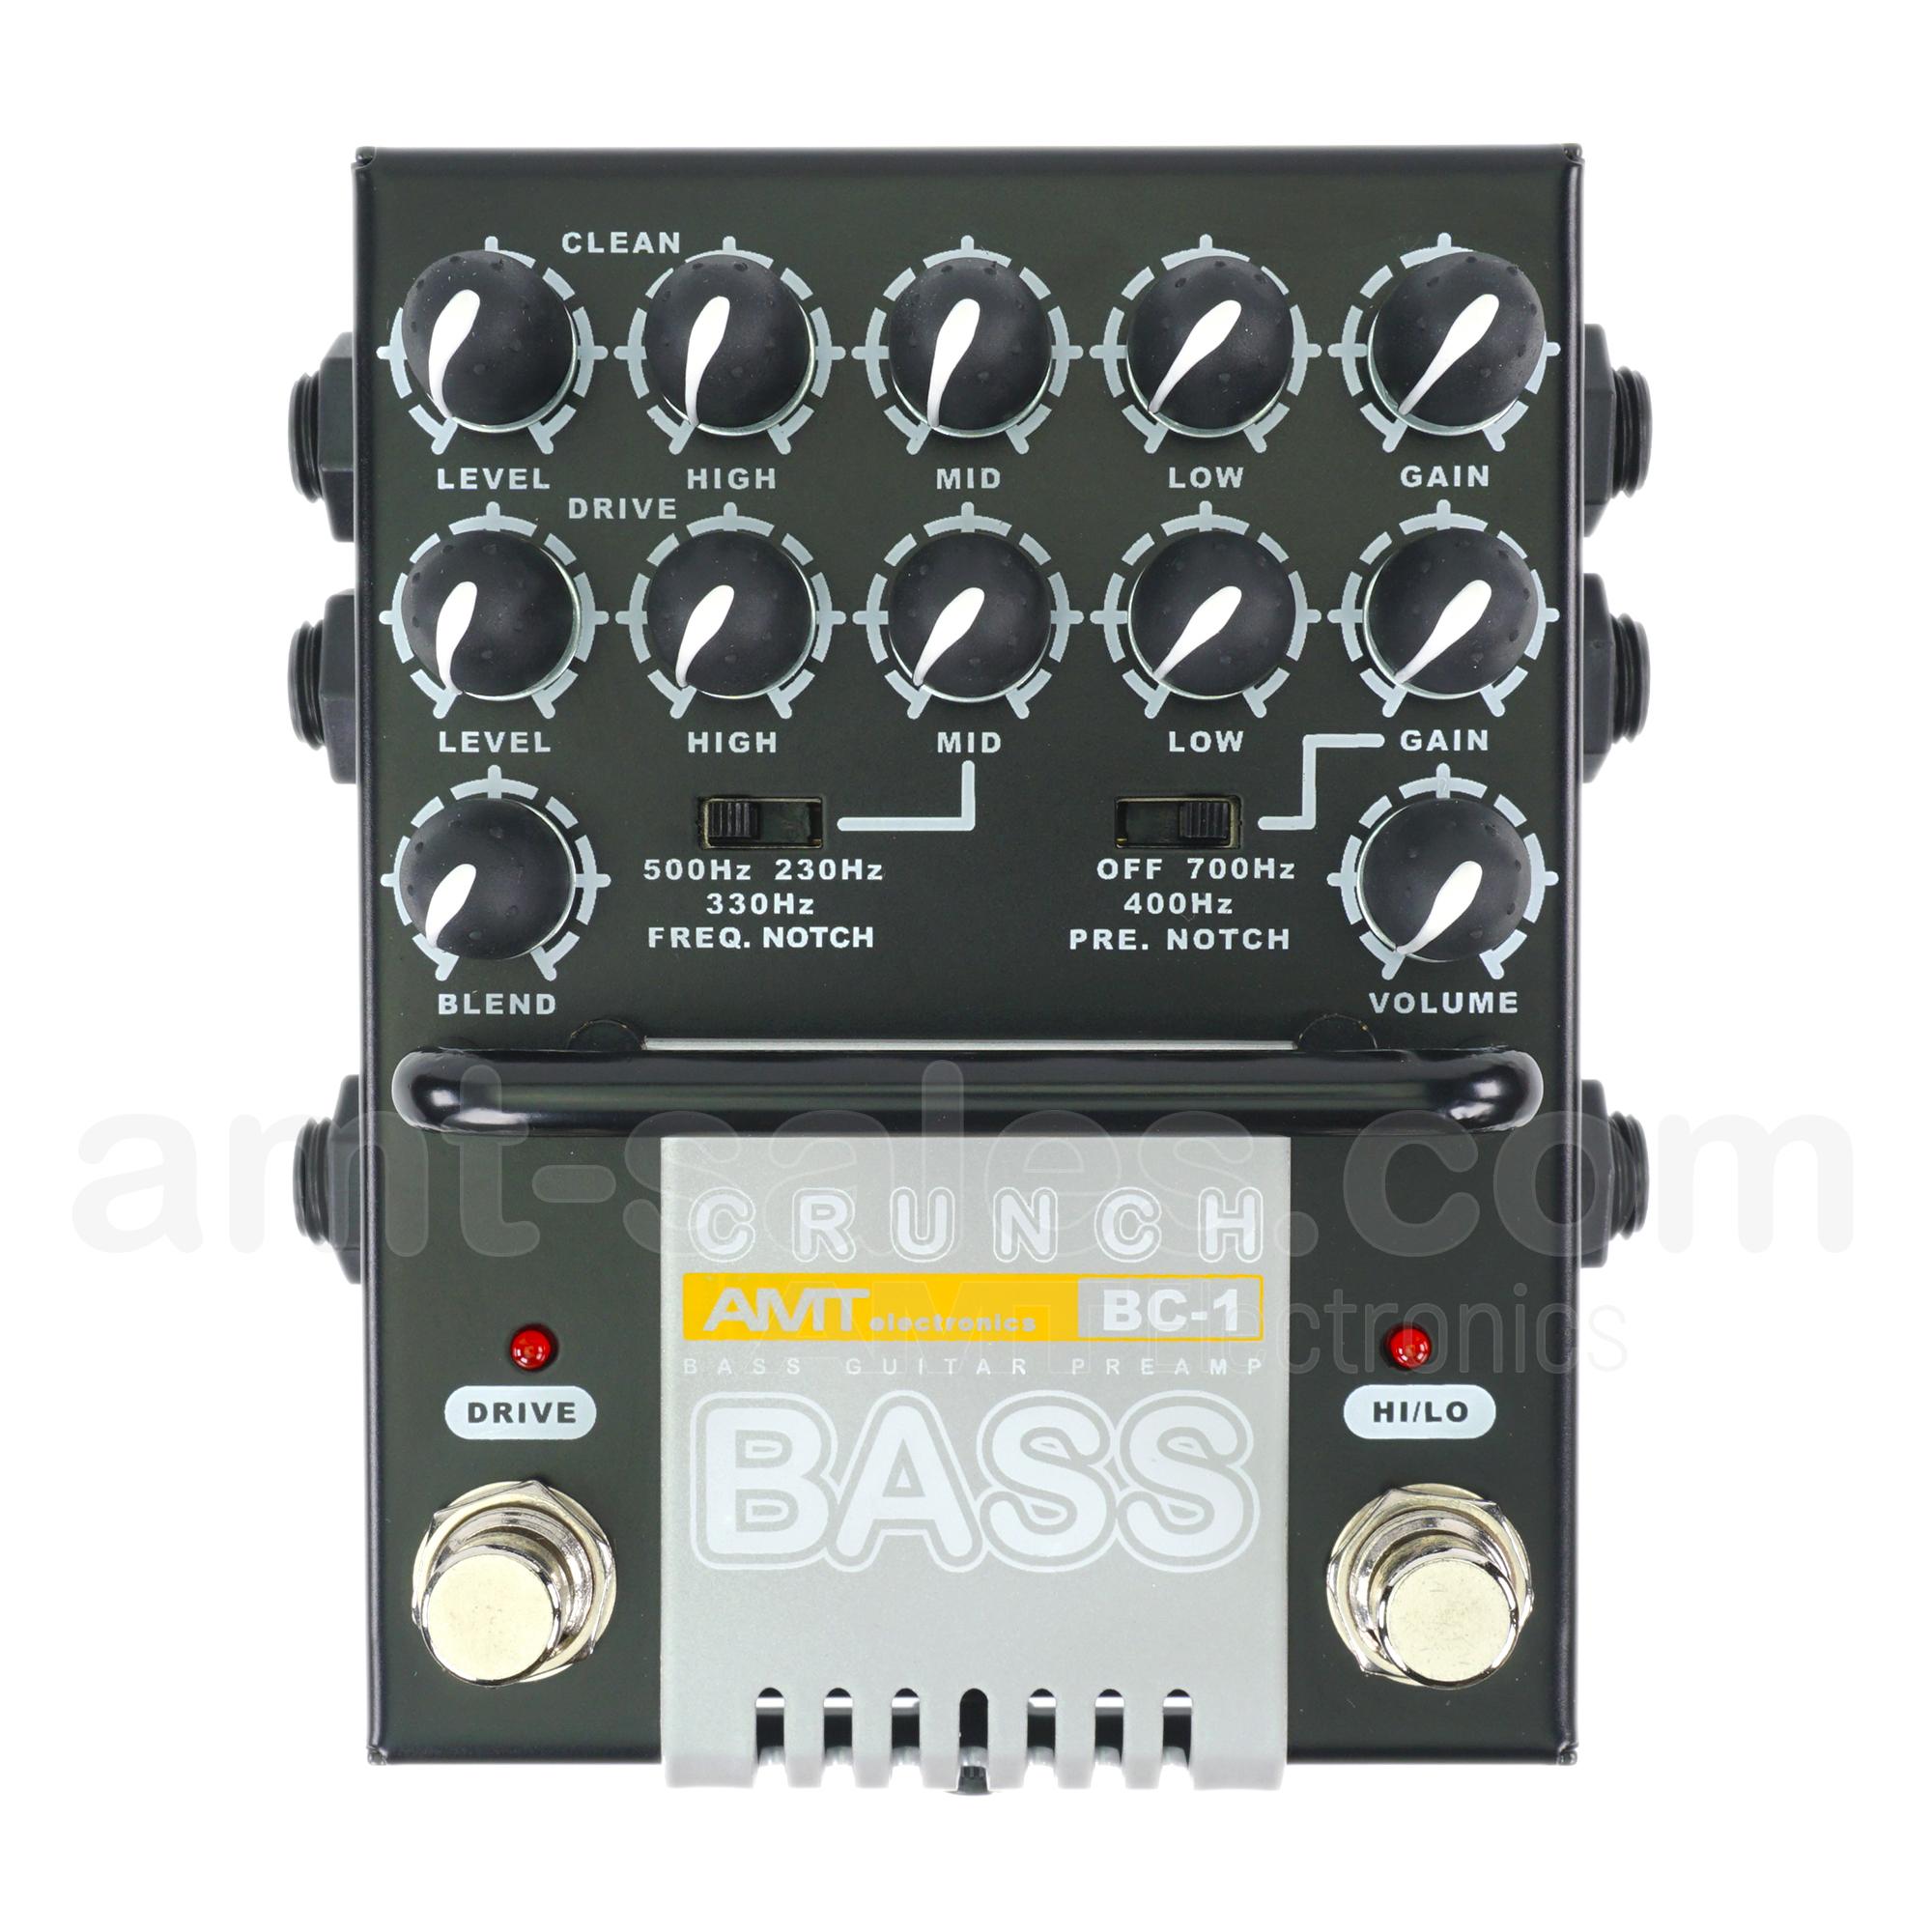 AMT Bass Crunch BC-1 - 2-channel JFET bass guitar preamp